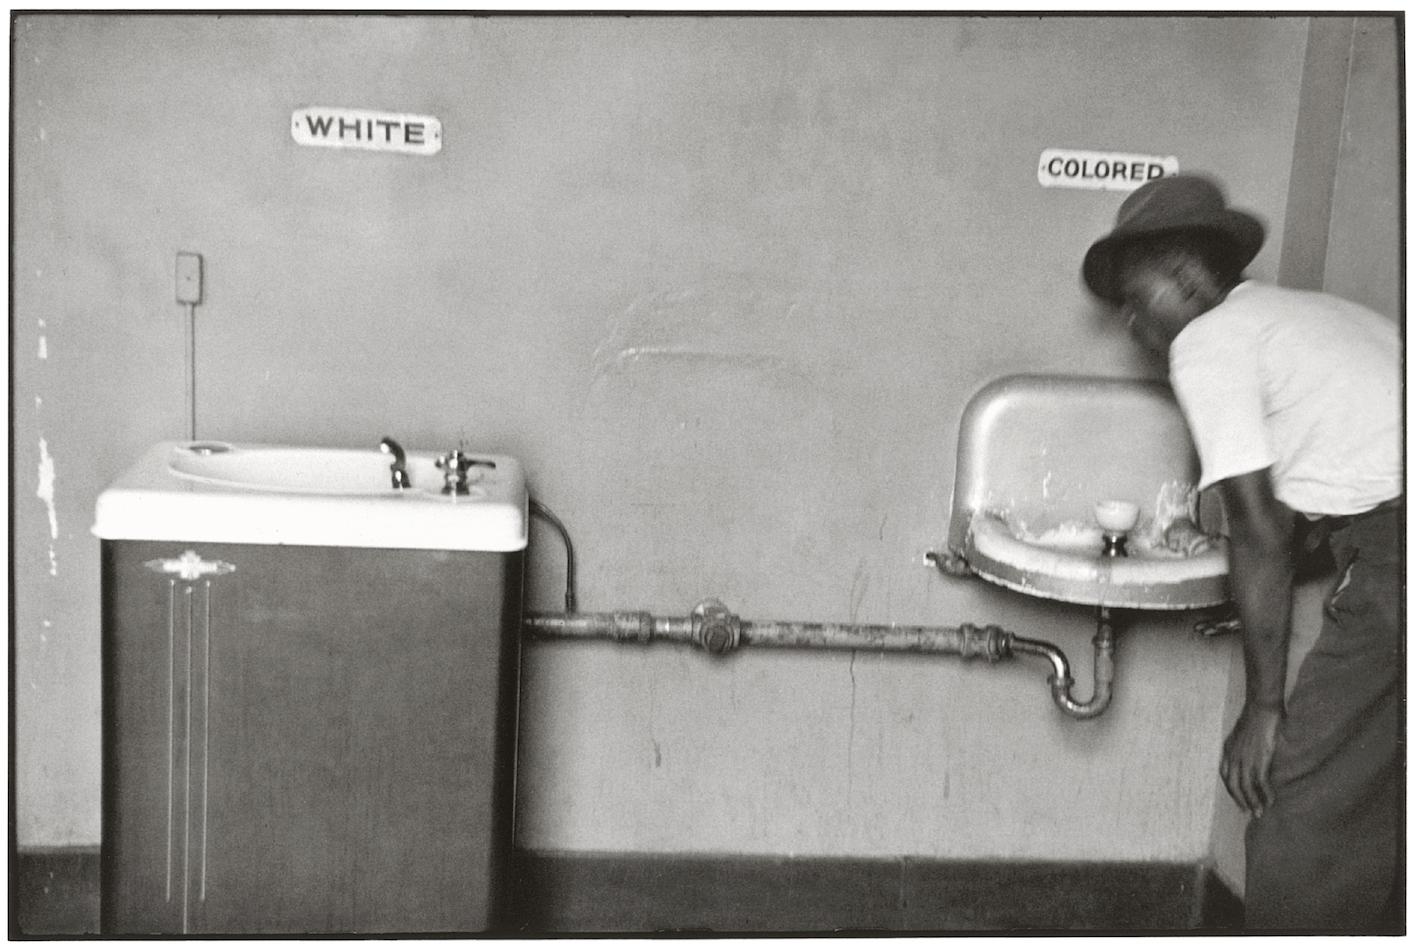 North Carolina, Stati Uniti, 1950. Foto di Elliot Erwitt.